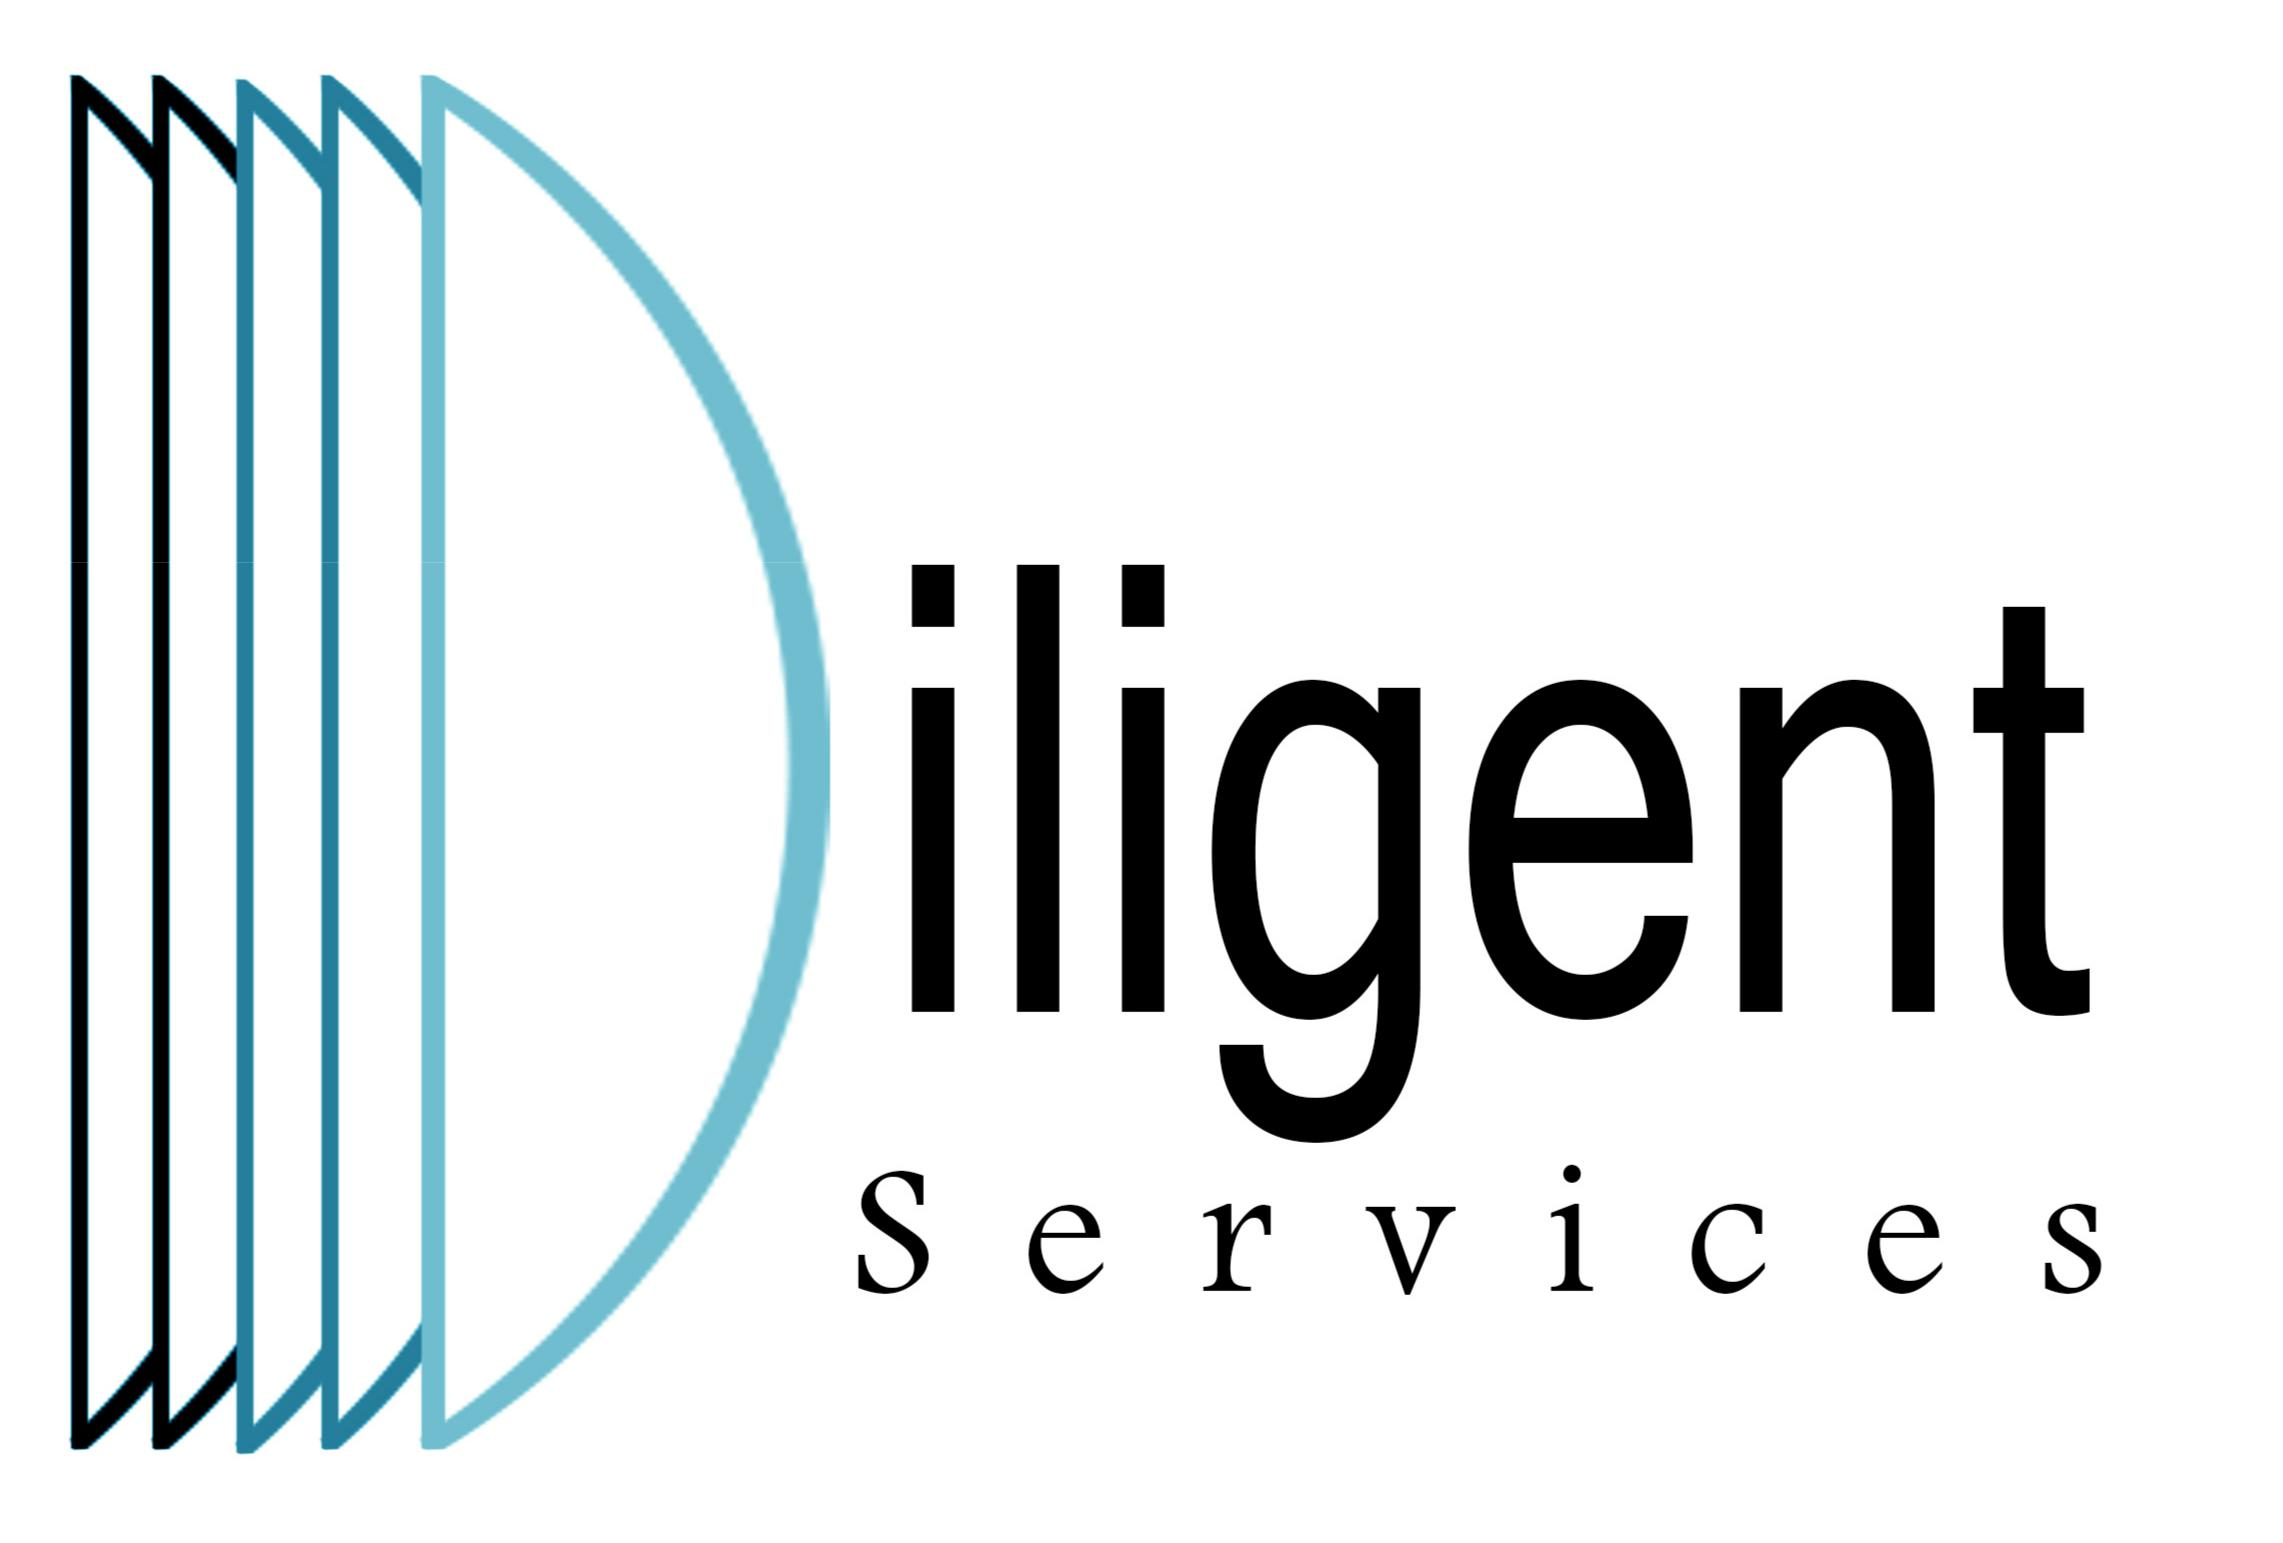 Diligent Services